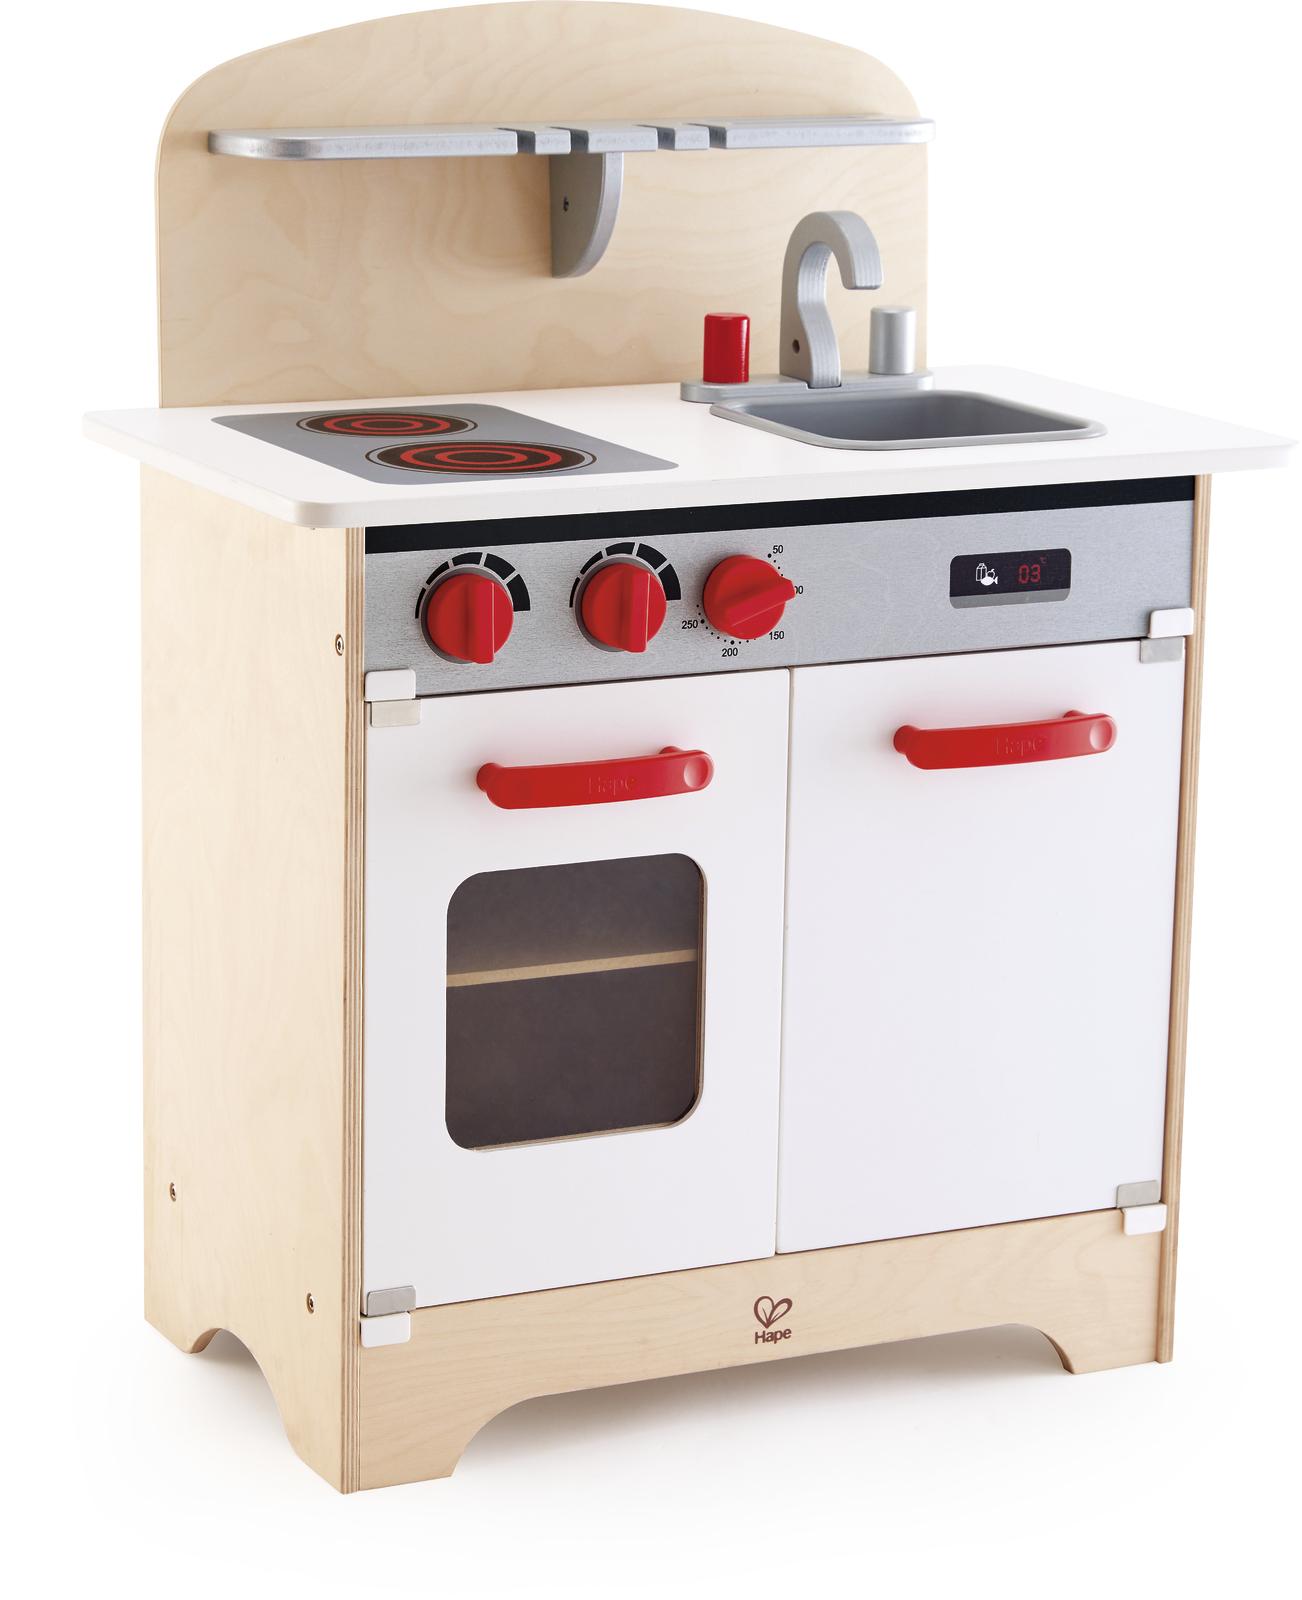 Hape: White Gourmet Kitchen image